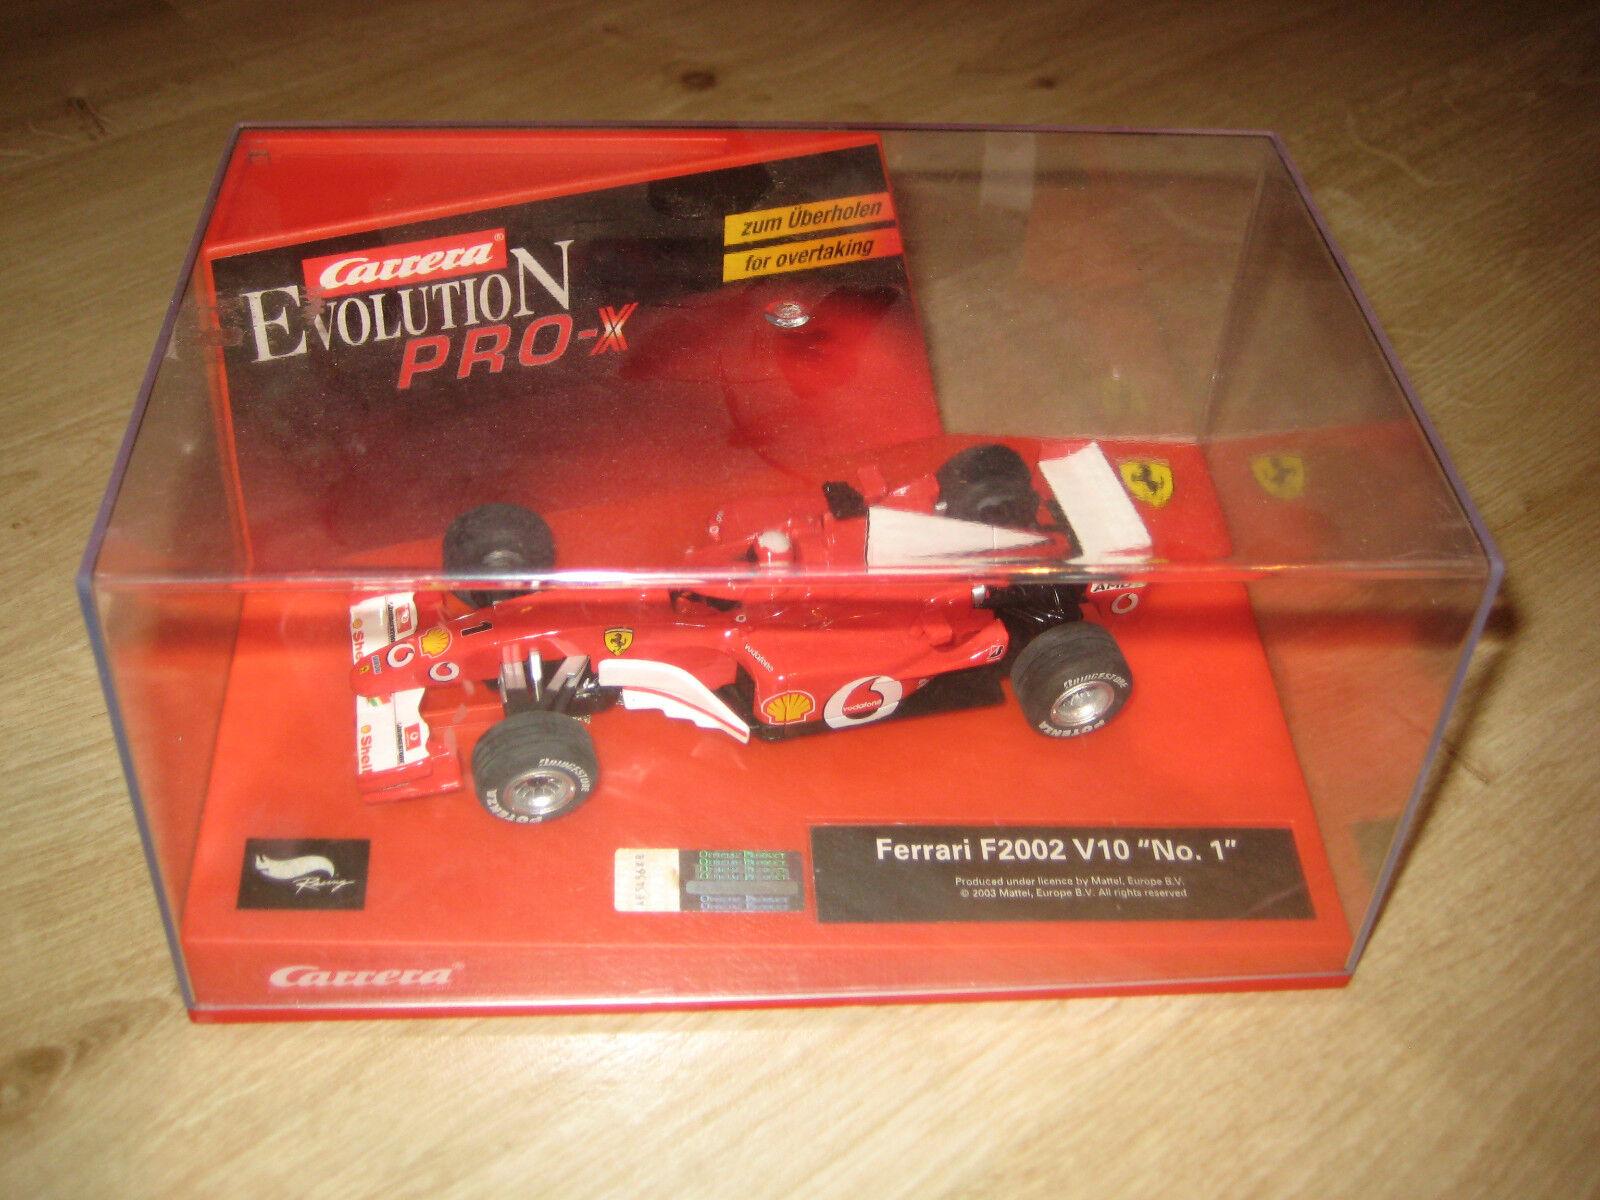 Carrera Pro-X 30201 Ferrari F2002 V10 No. 1 OVP & NEU (altes Boxendesign)